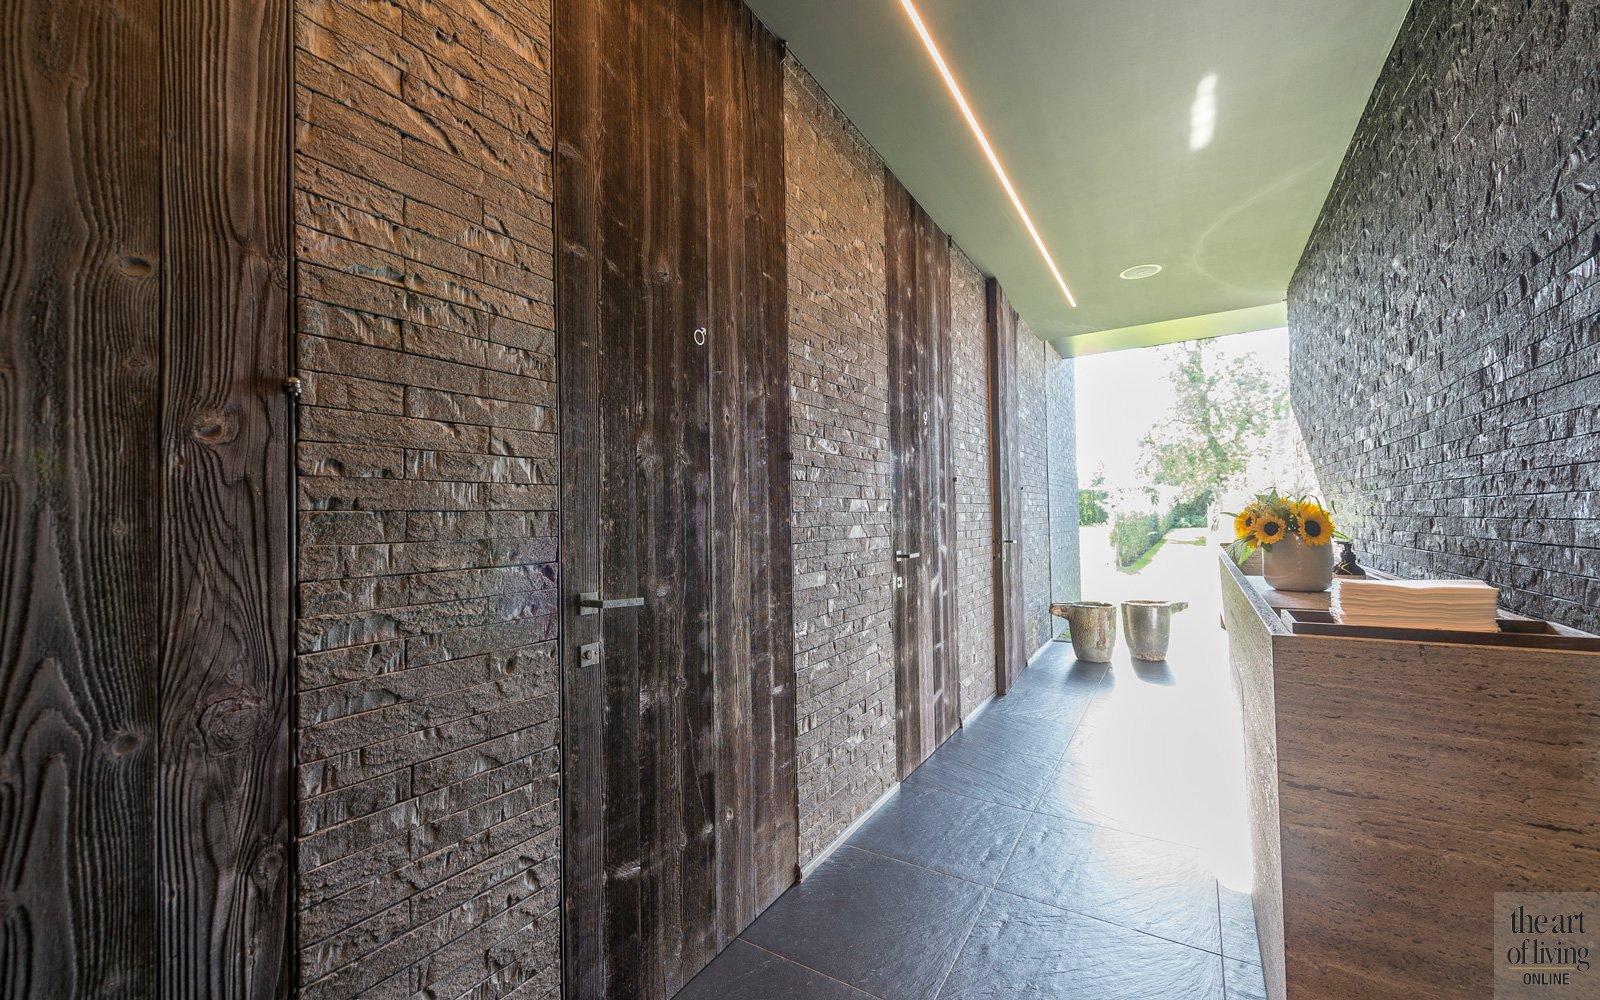 Vilvordit keramische teges, Vloeren Franssens, Restaurant Hertog Jan, Deleu – Styling Decor, barnwood